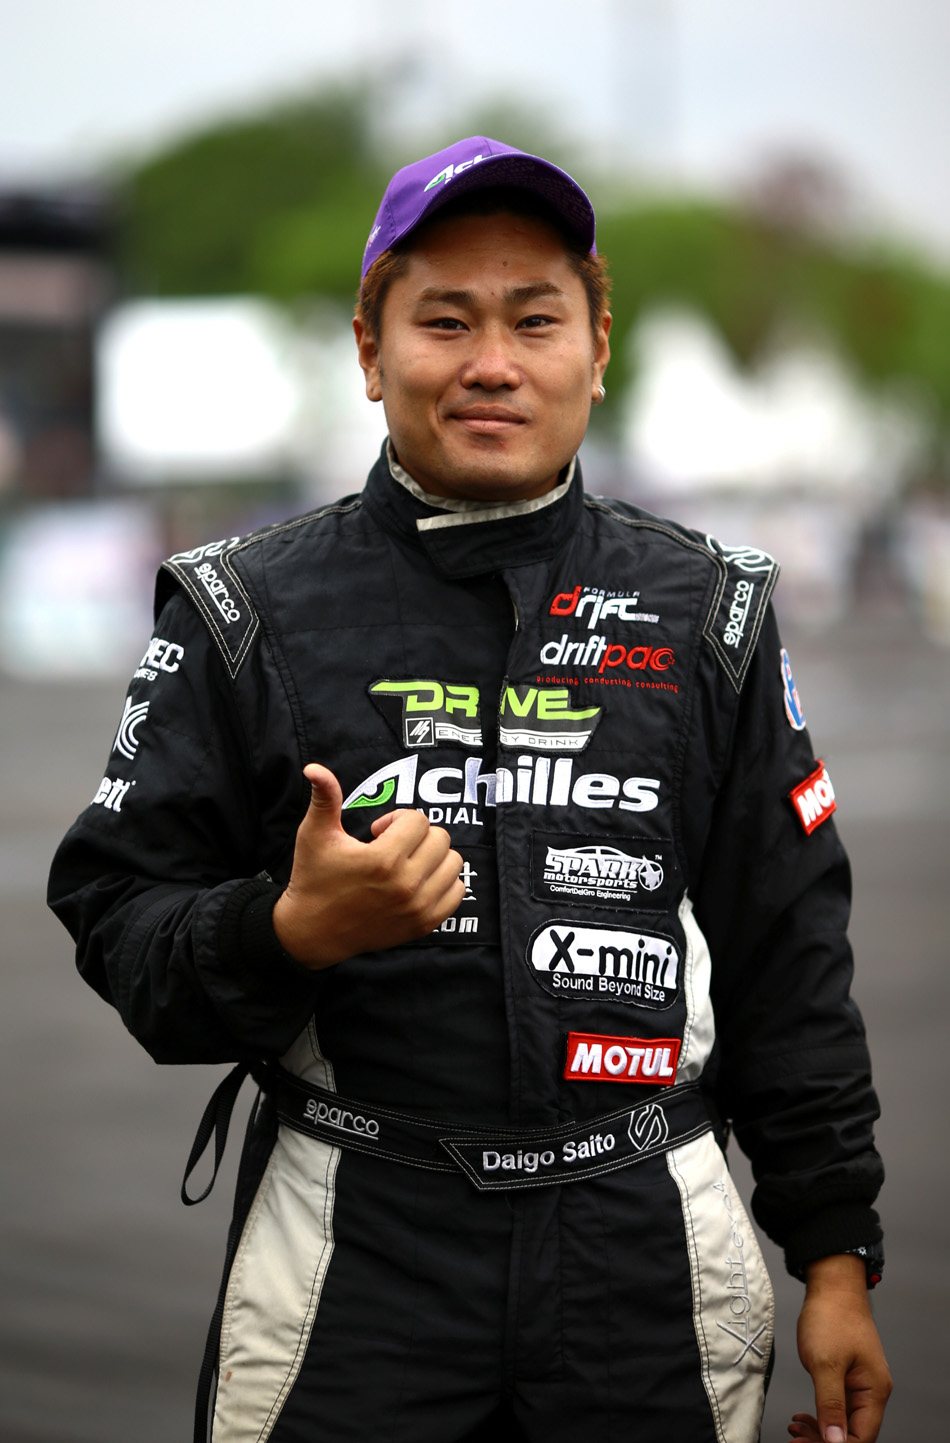 Daigo Saito drifting in australia